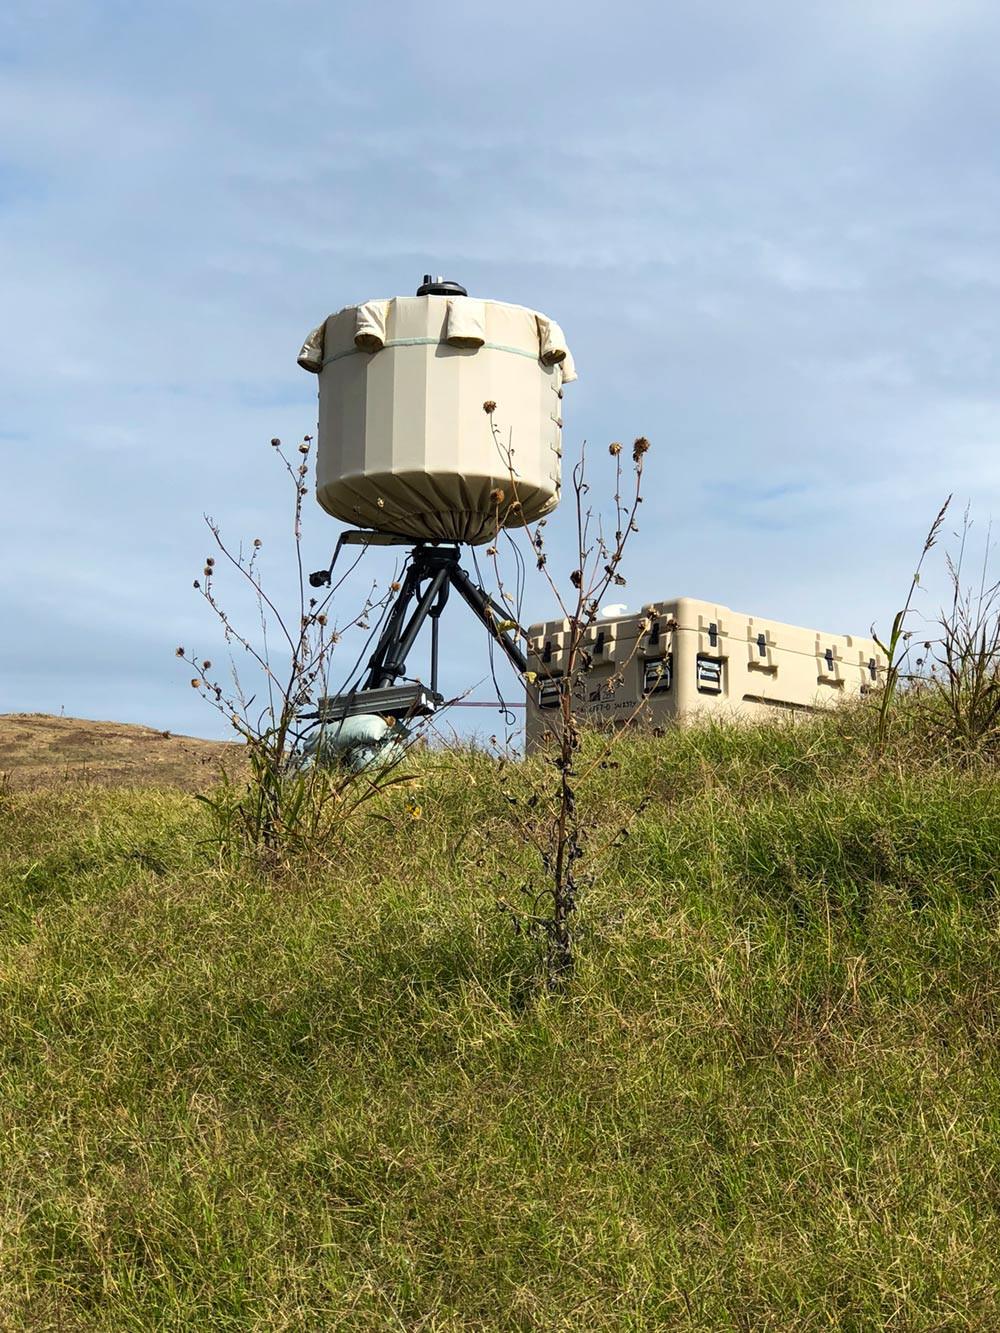 SRC's AN/TPQ-49 radar provides air surveillance for G7 Summit in Charlevoix, Quebec